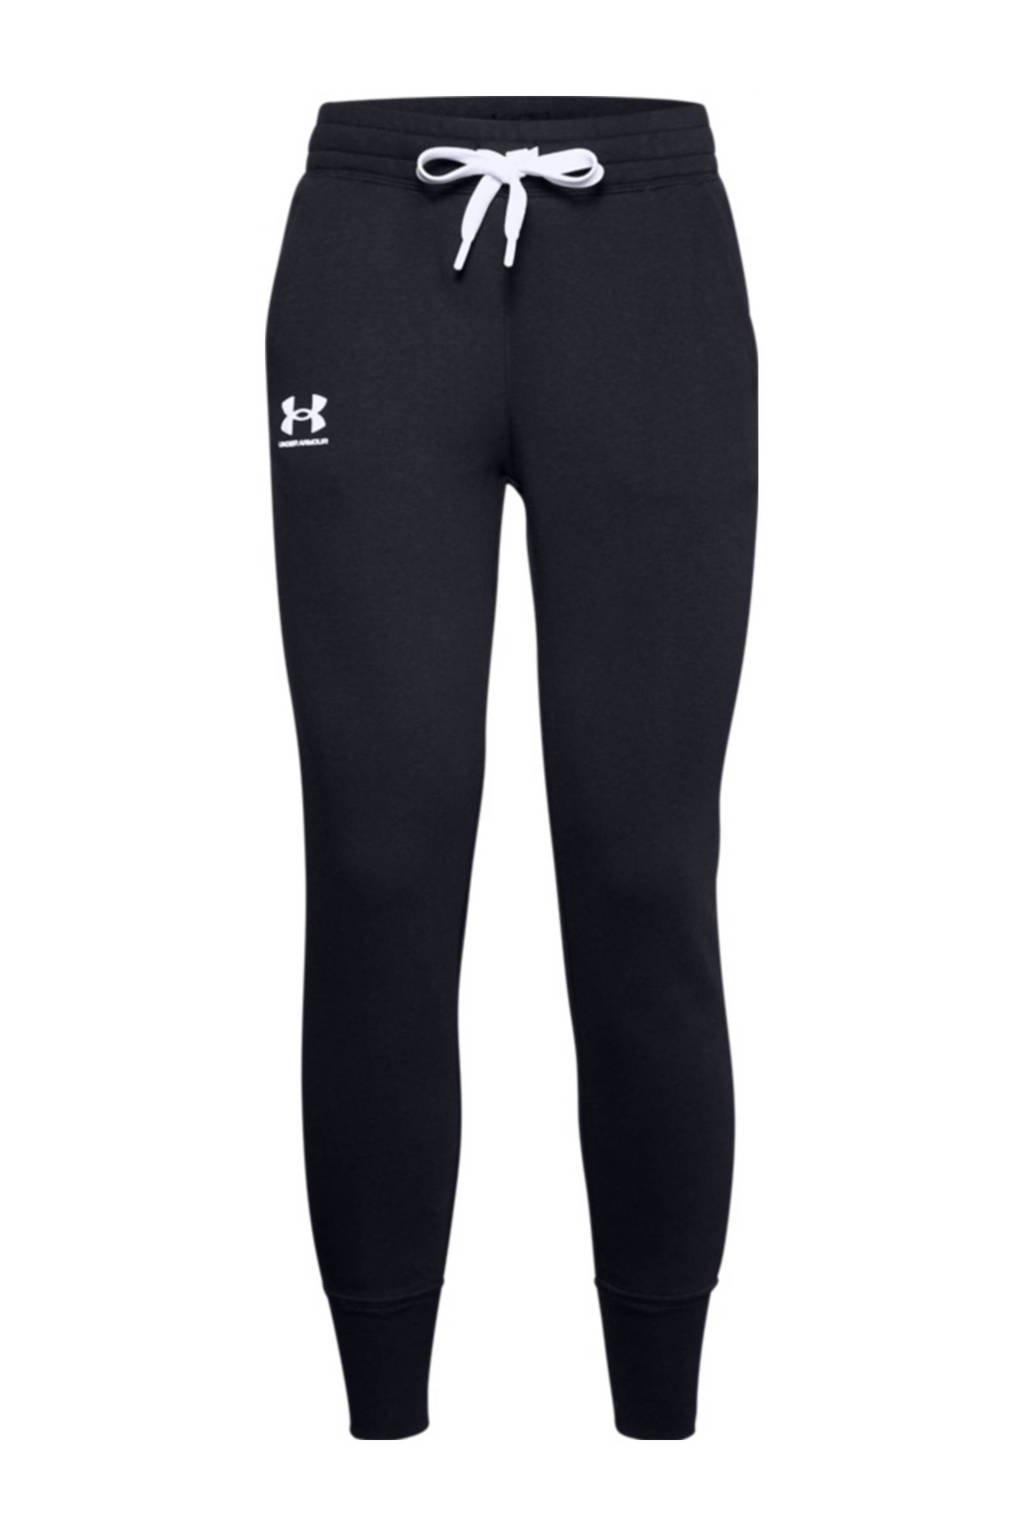 Under Armour joggingbroek zwart/wit, Zwart/wit